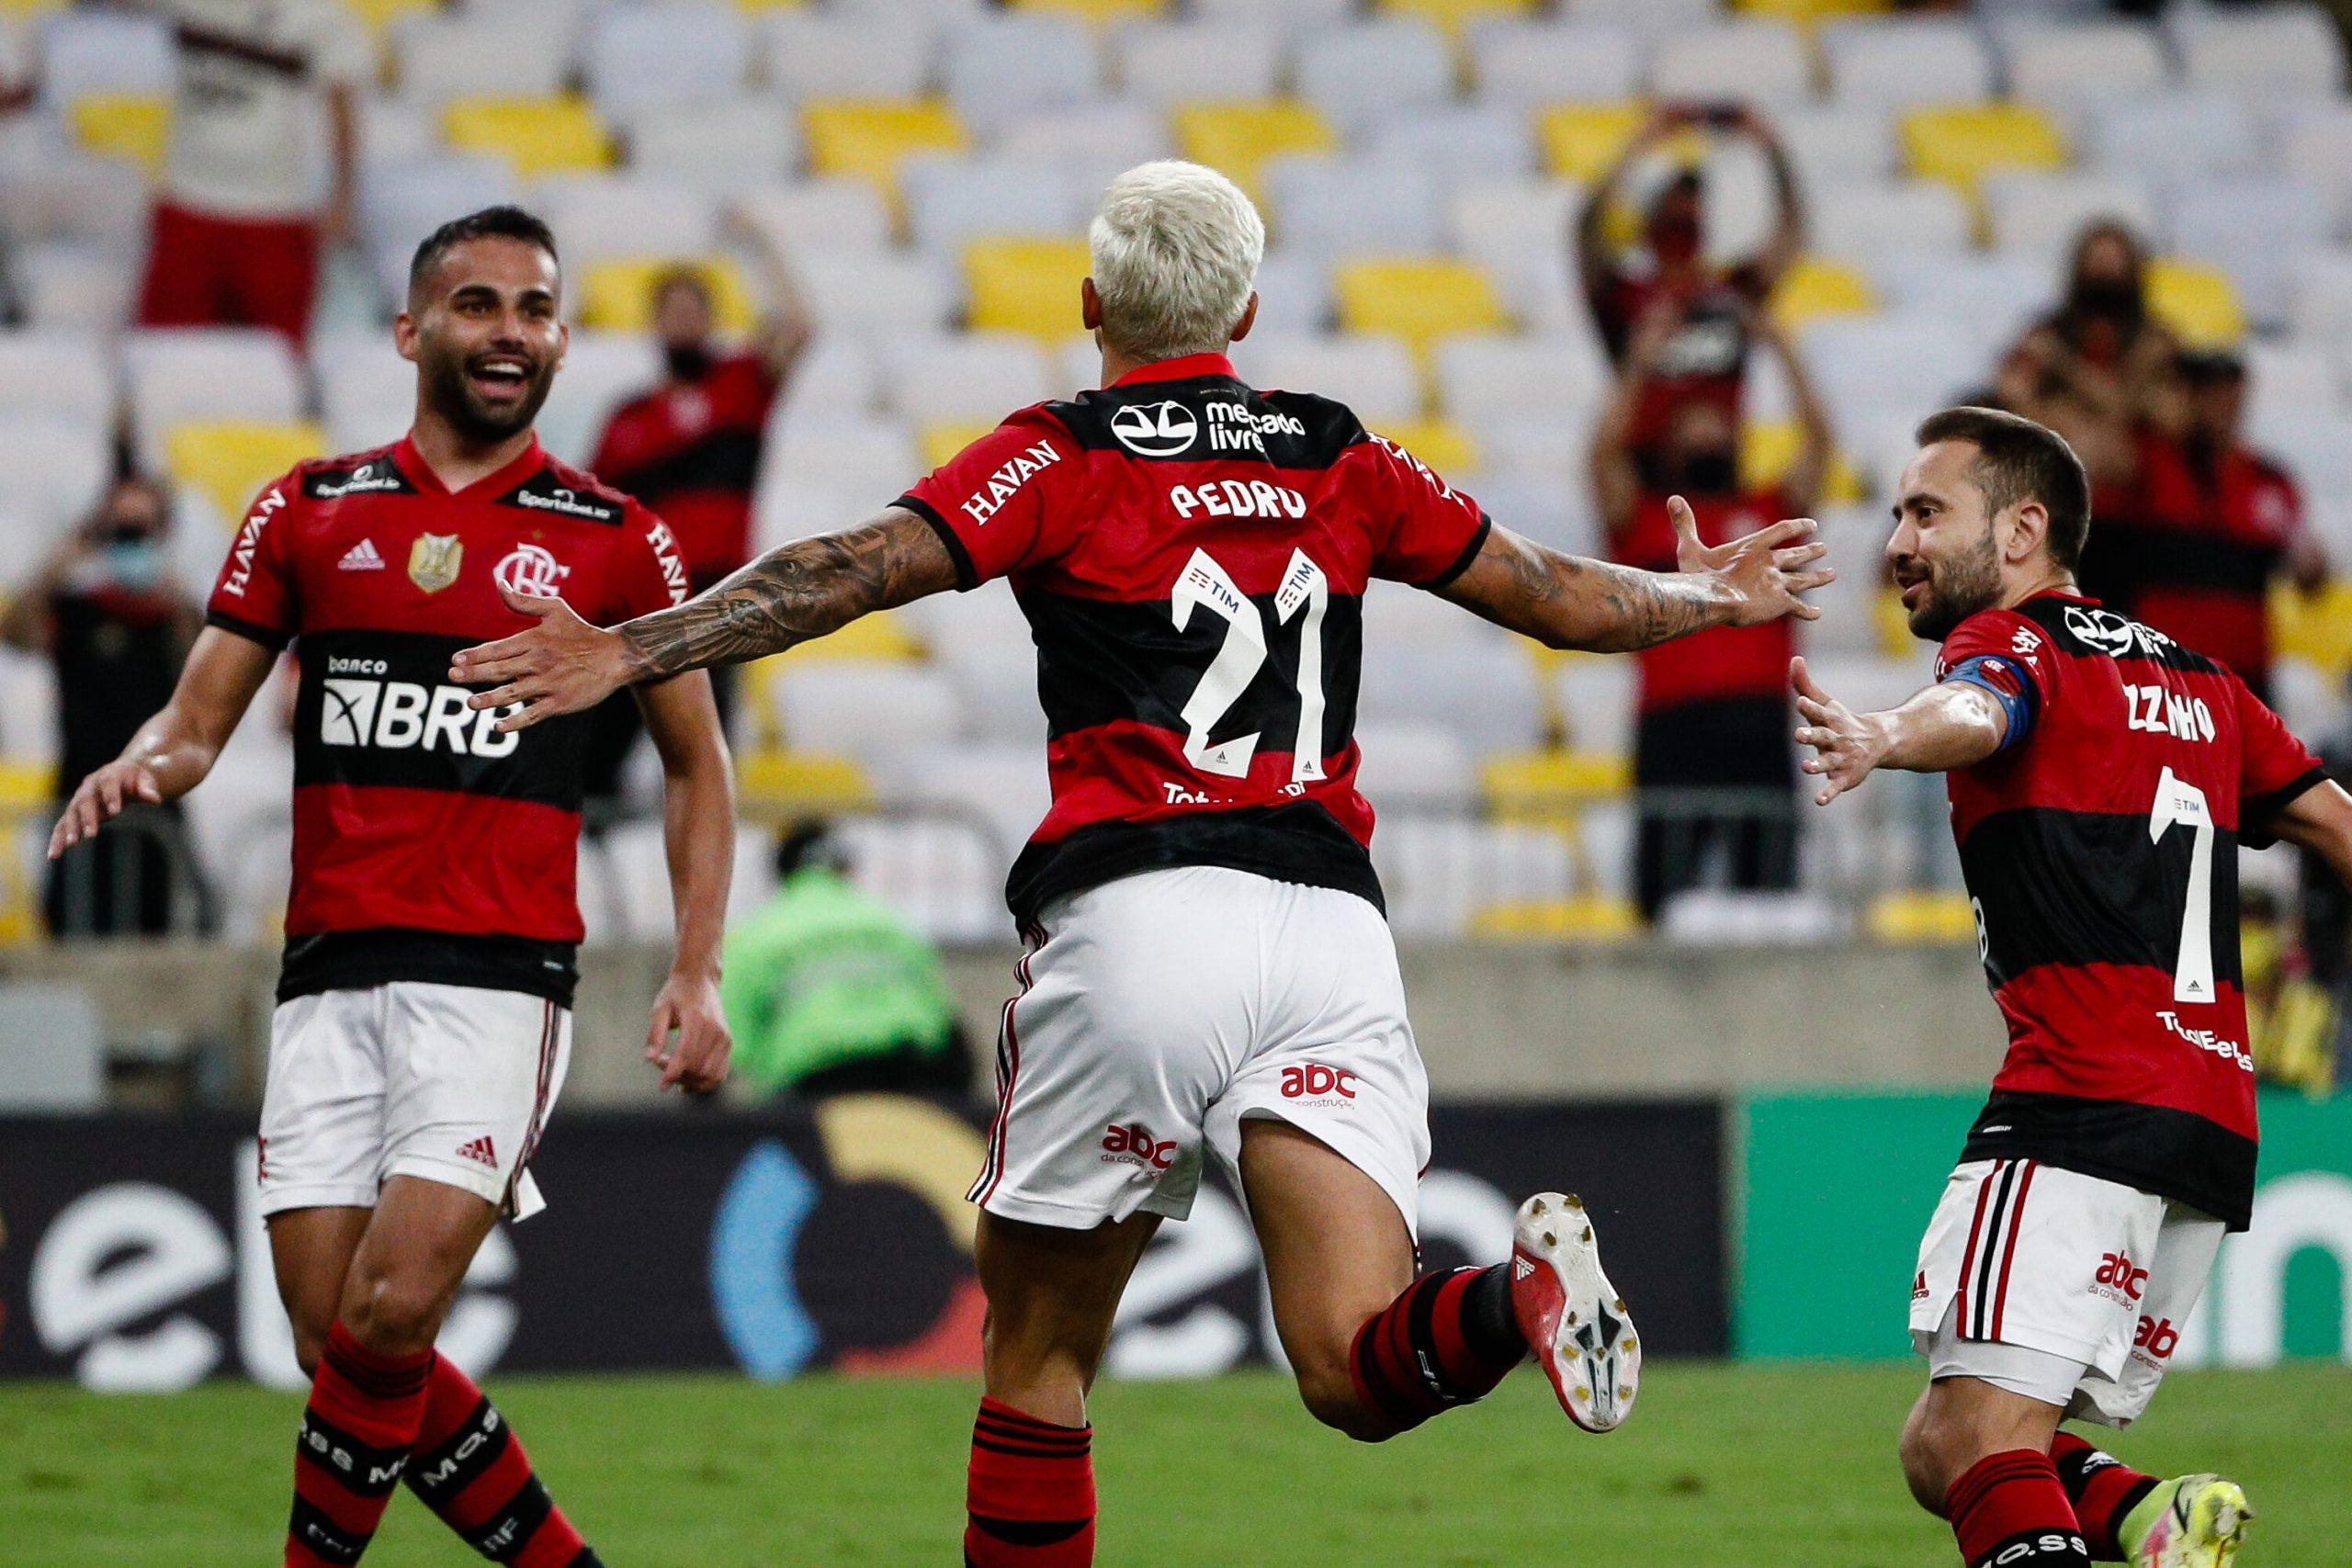 Assistir Barcelona Guayaquil x Flamengo ao vivo